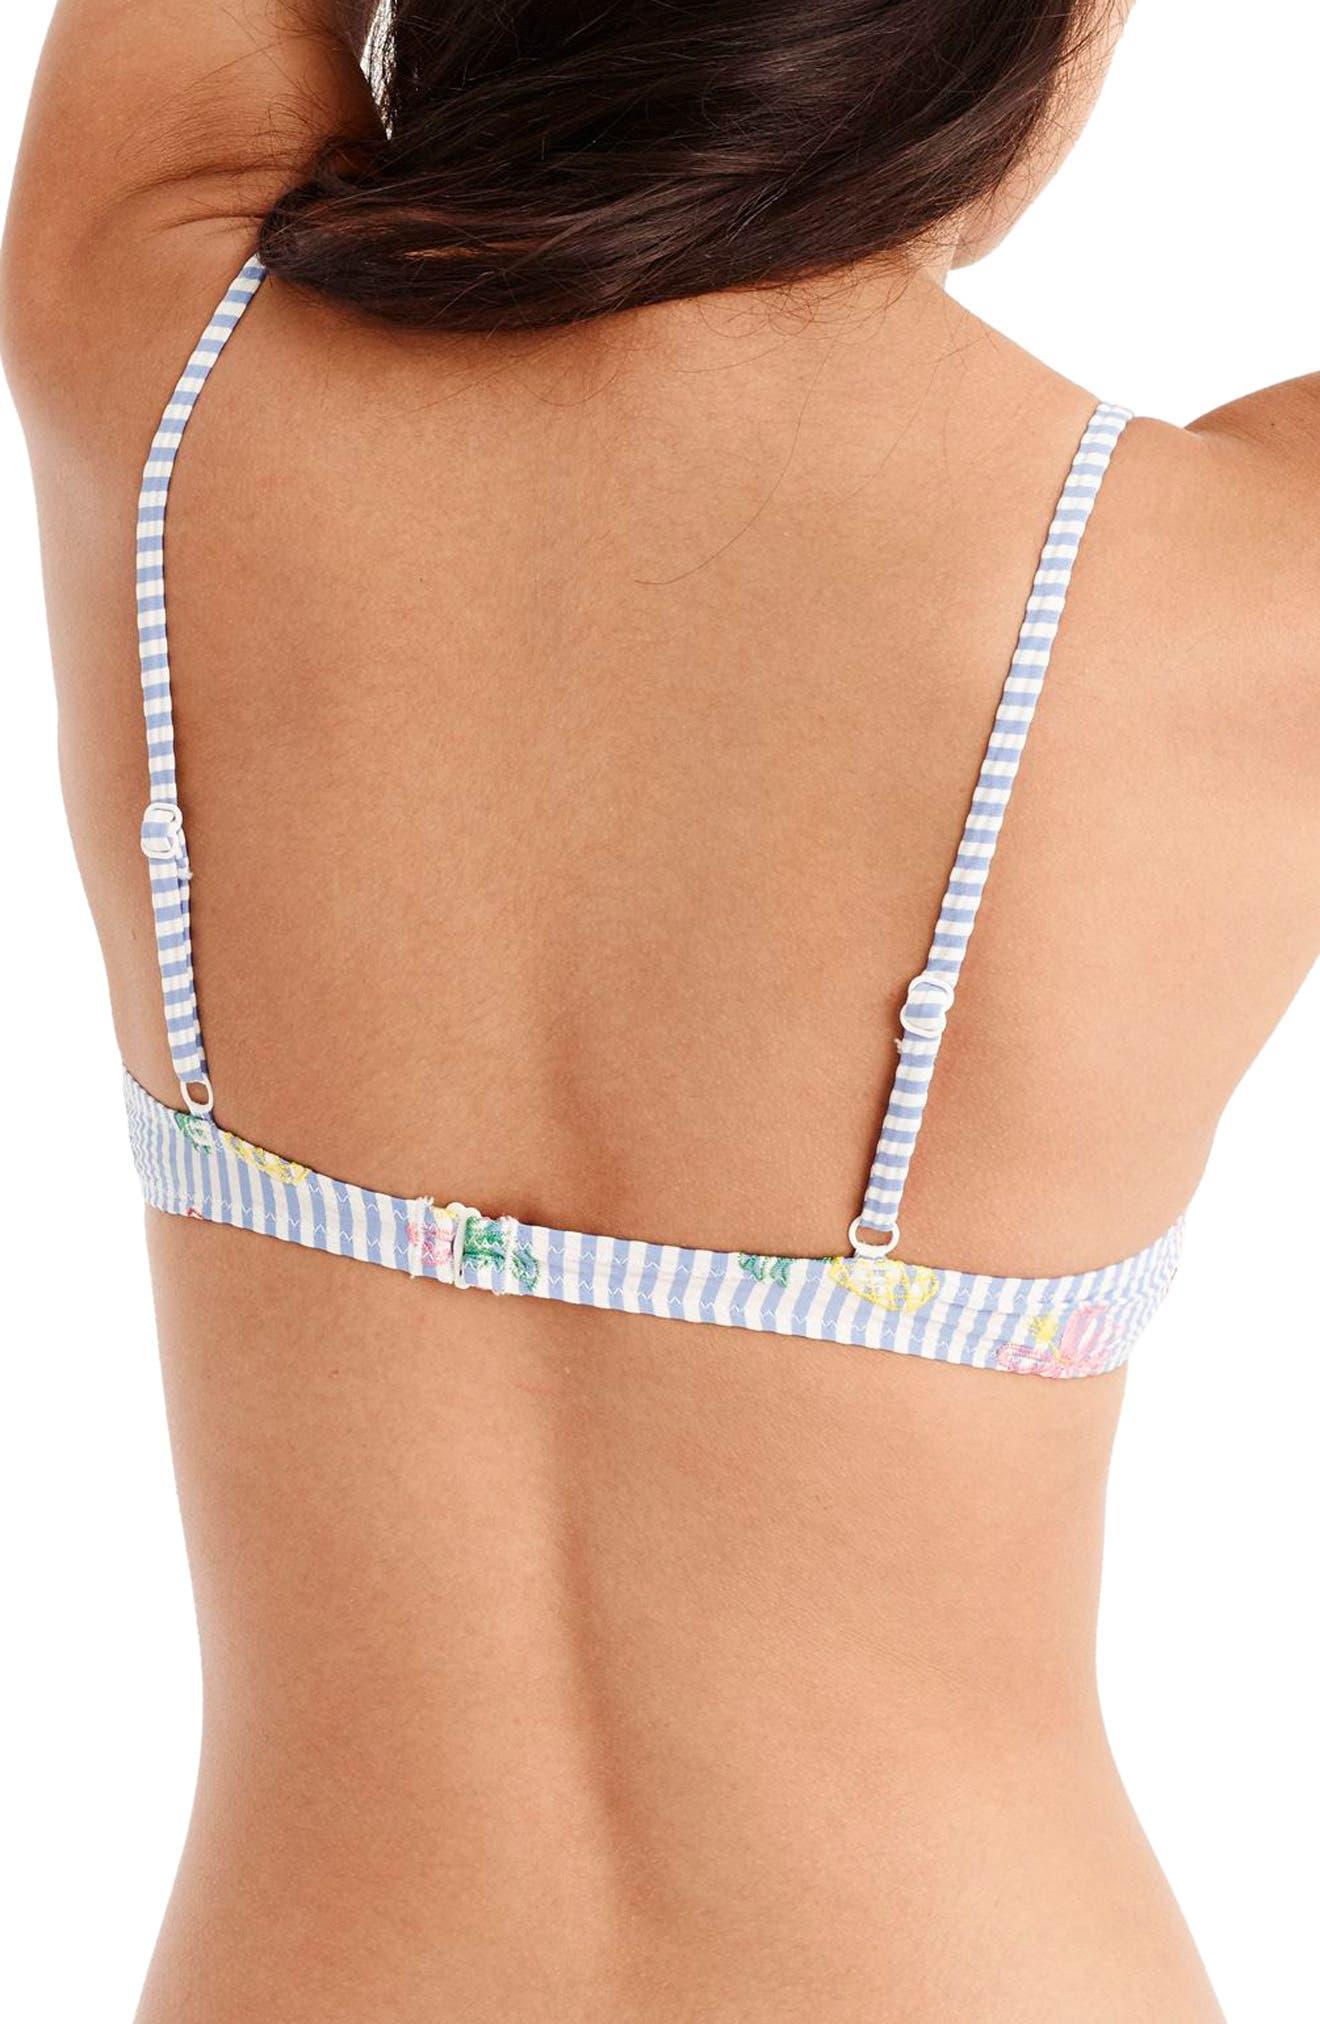 Seersucker French Bikini Top,                             Alternate thumbnail 2, color,                             600